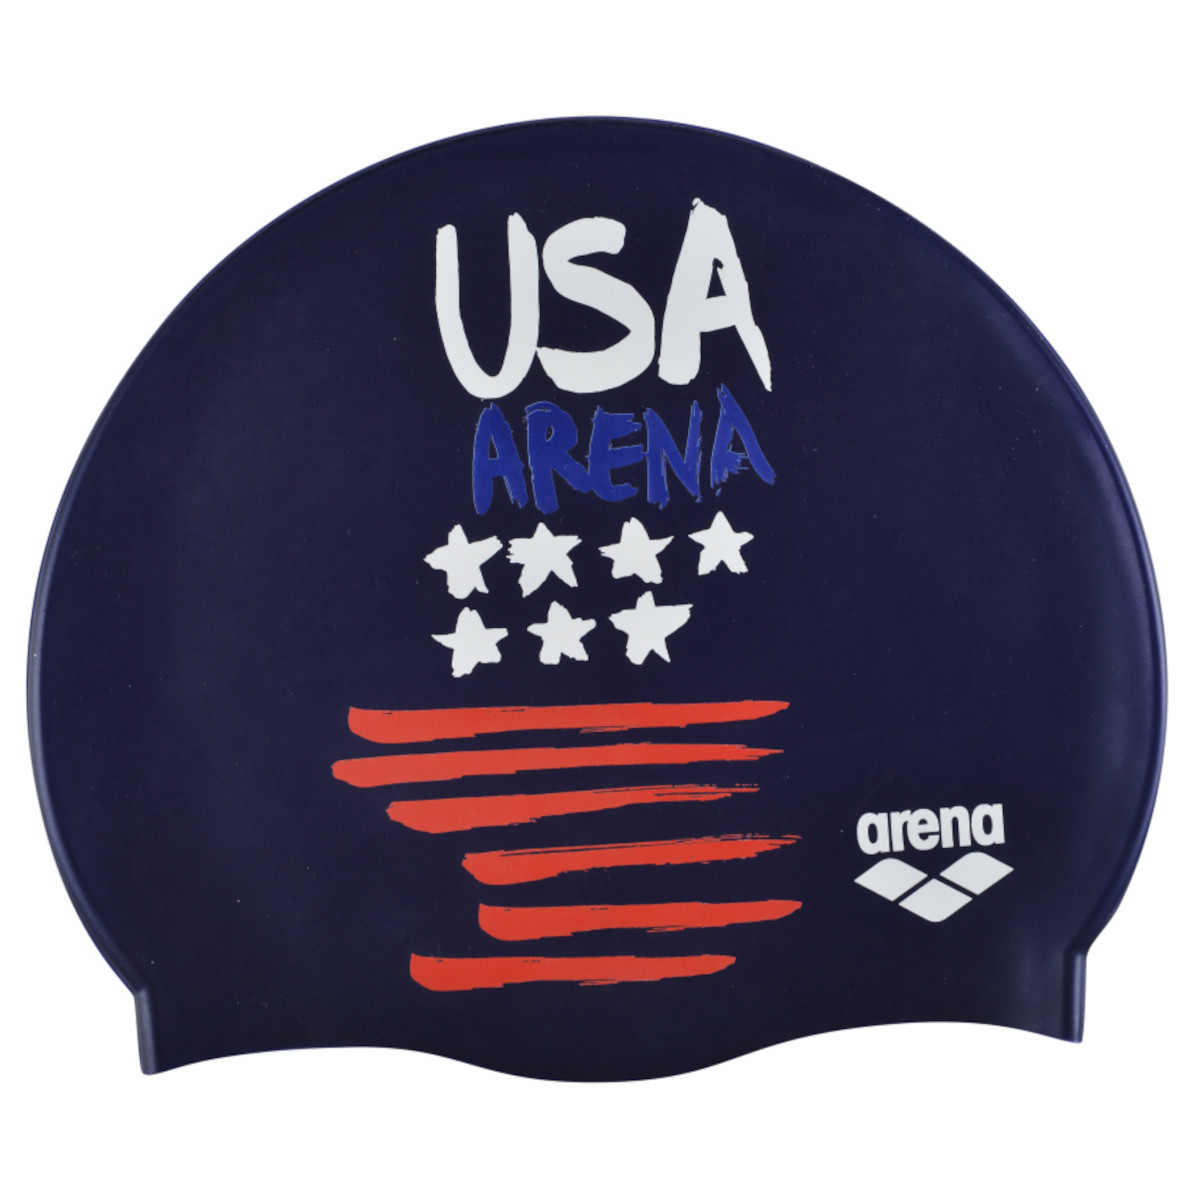 arena Flags Silicone Cap - USA